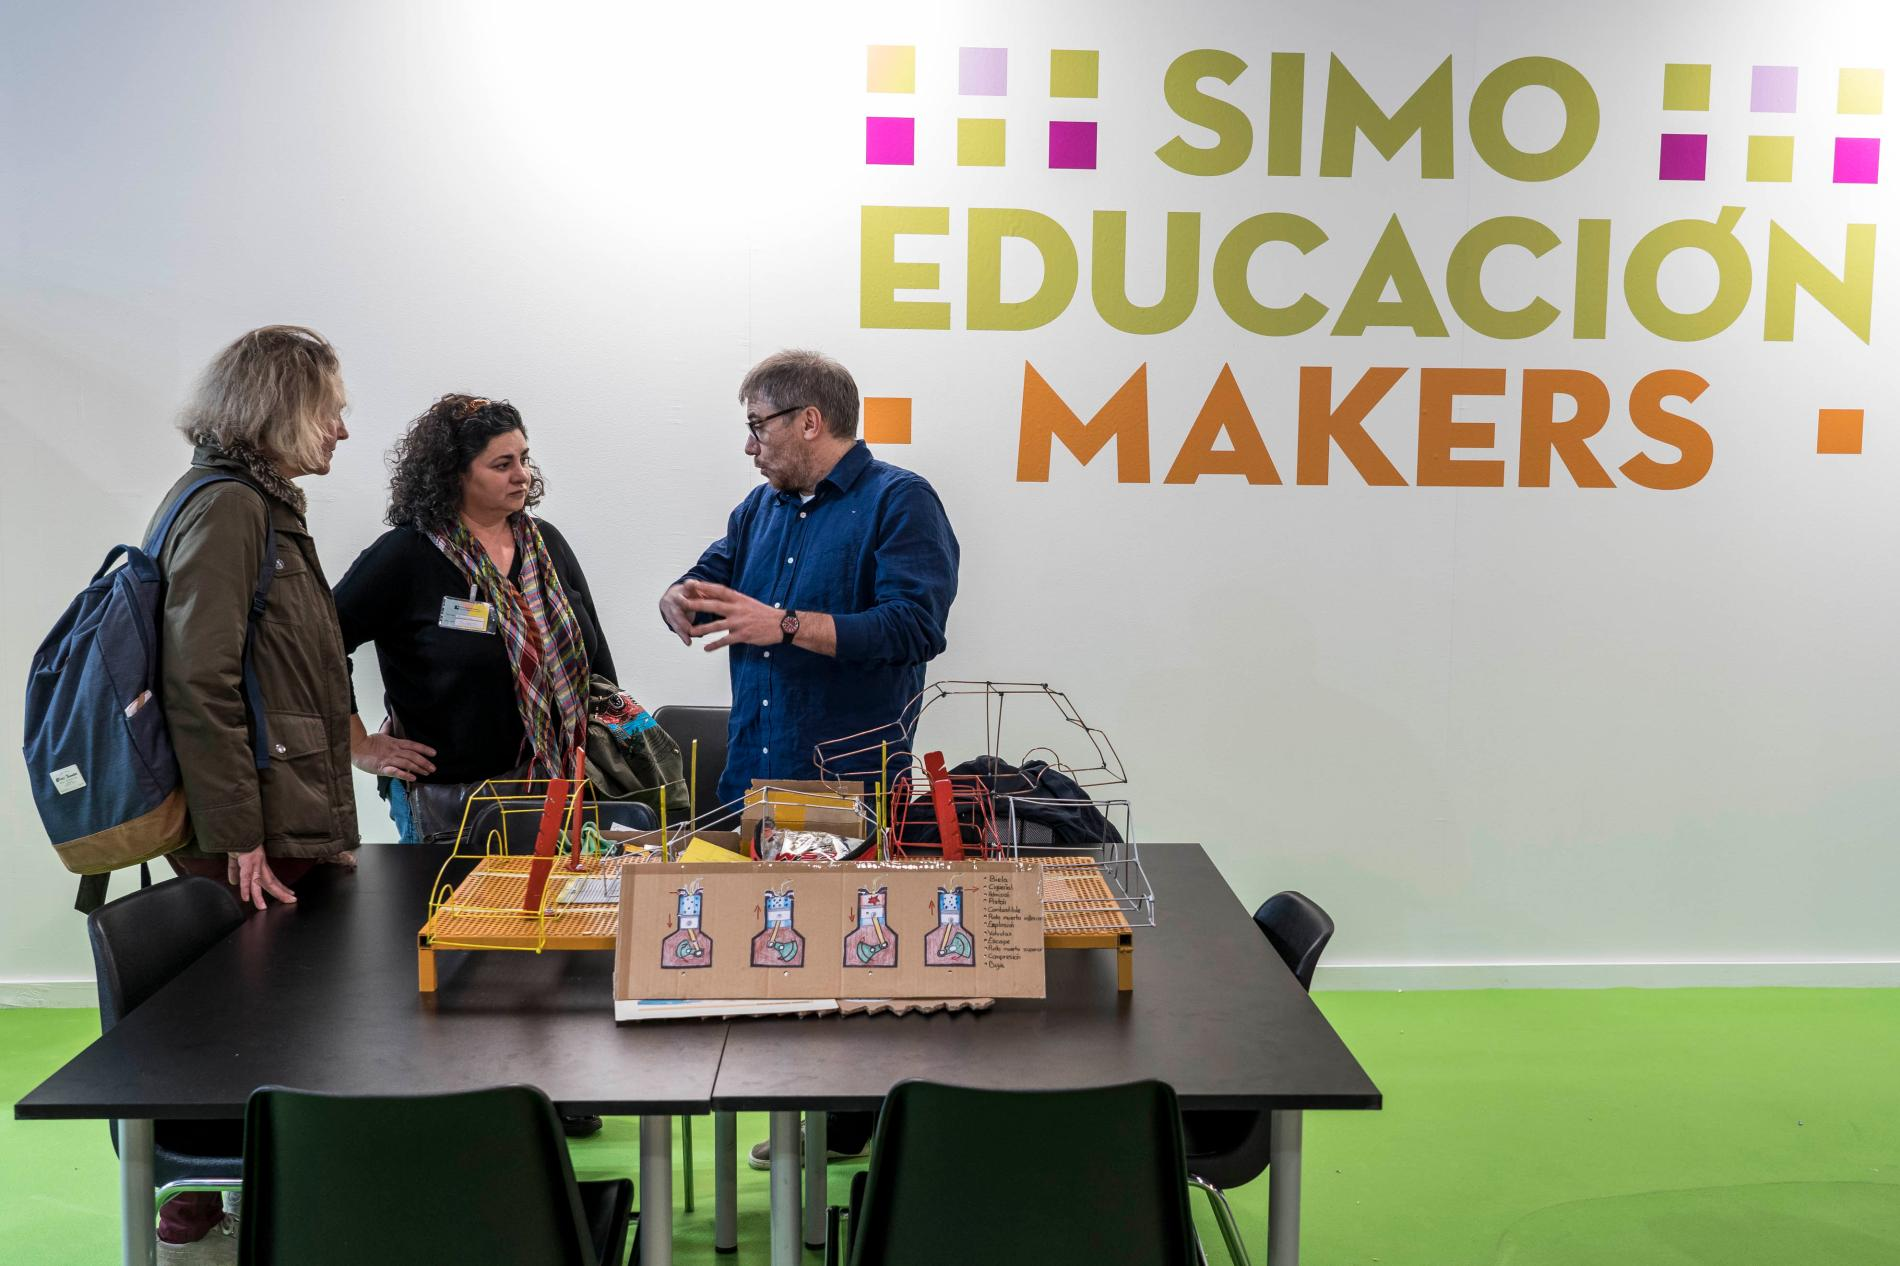 Simo-Educacion-Ifema-makers